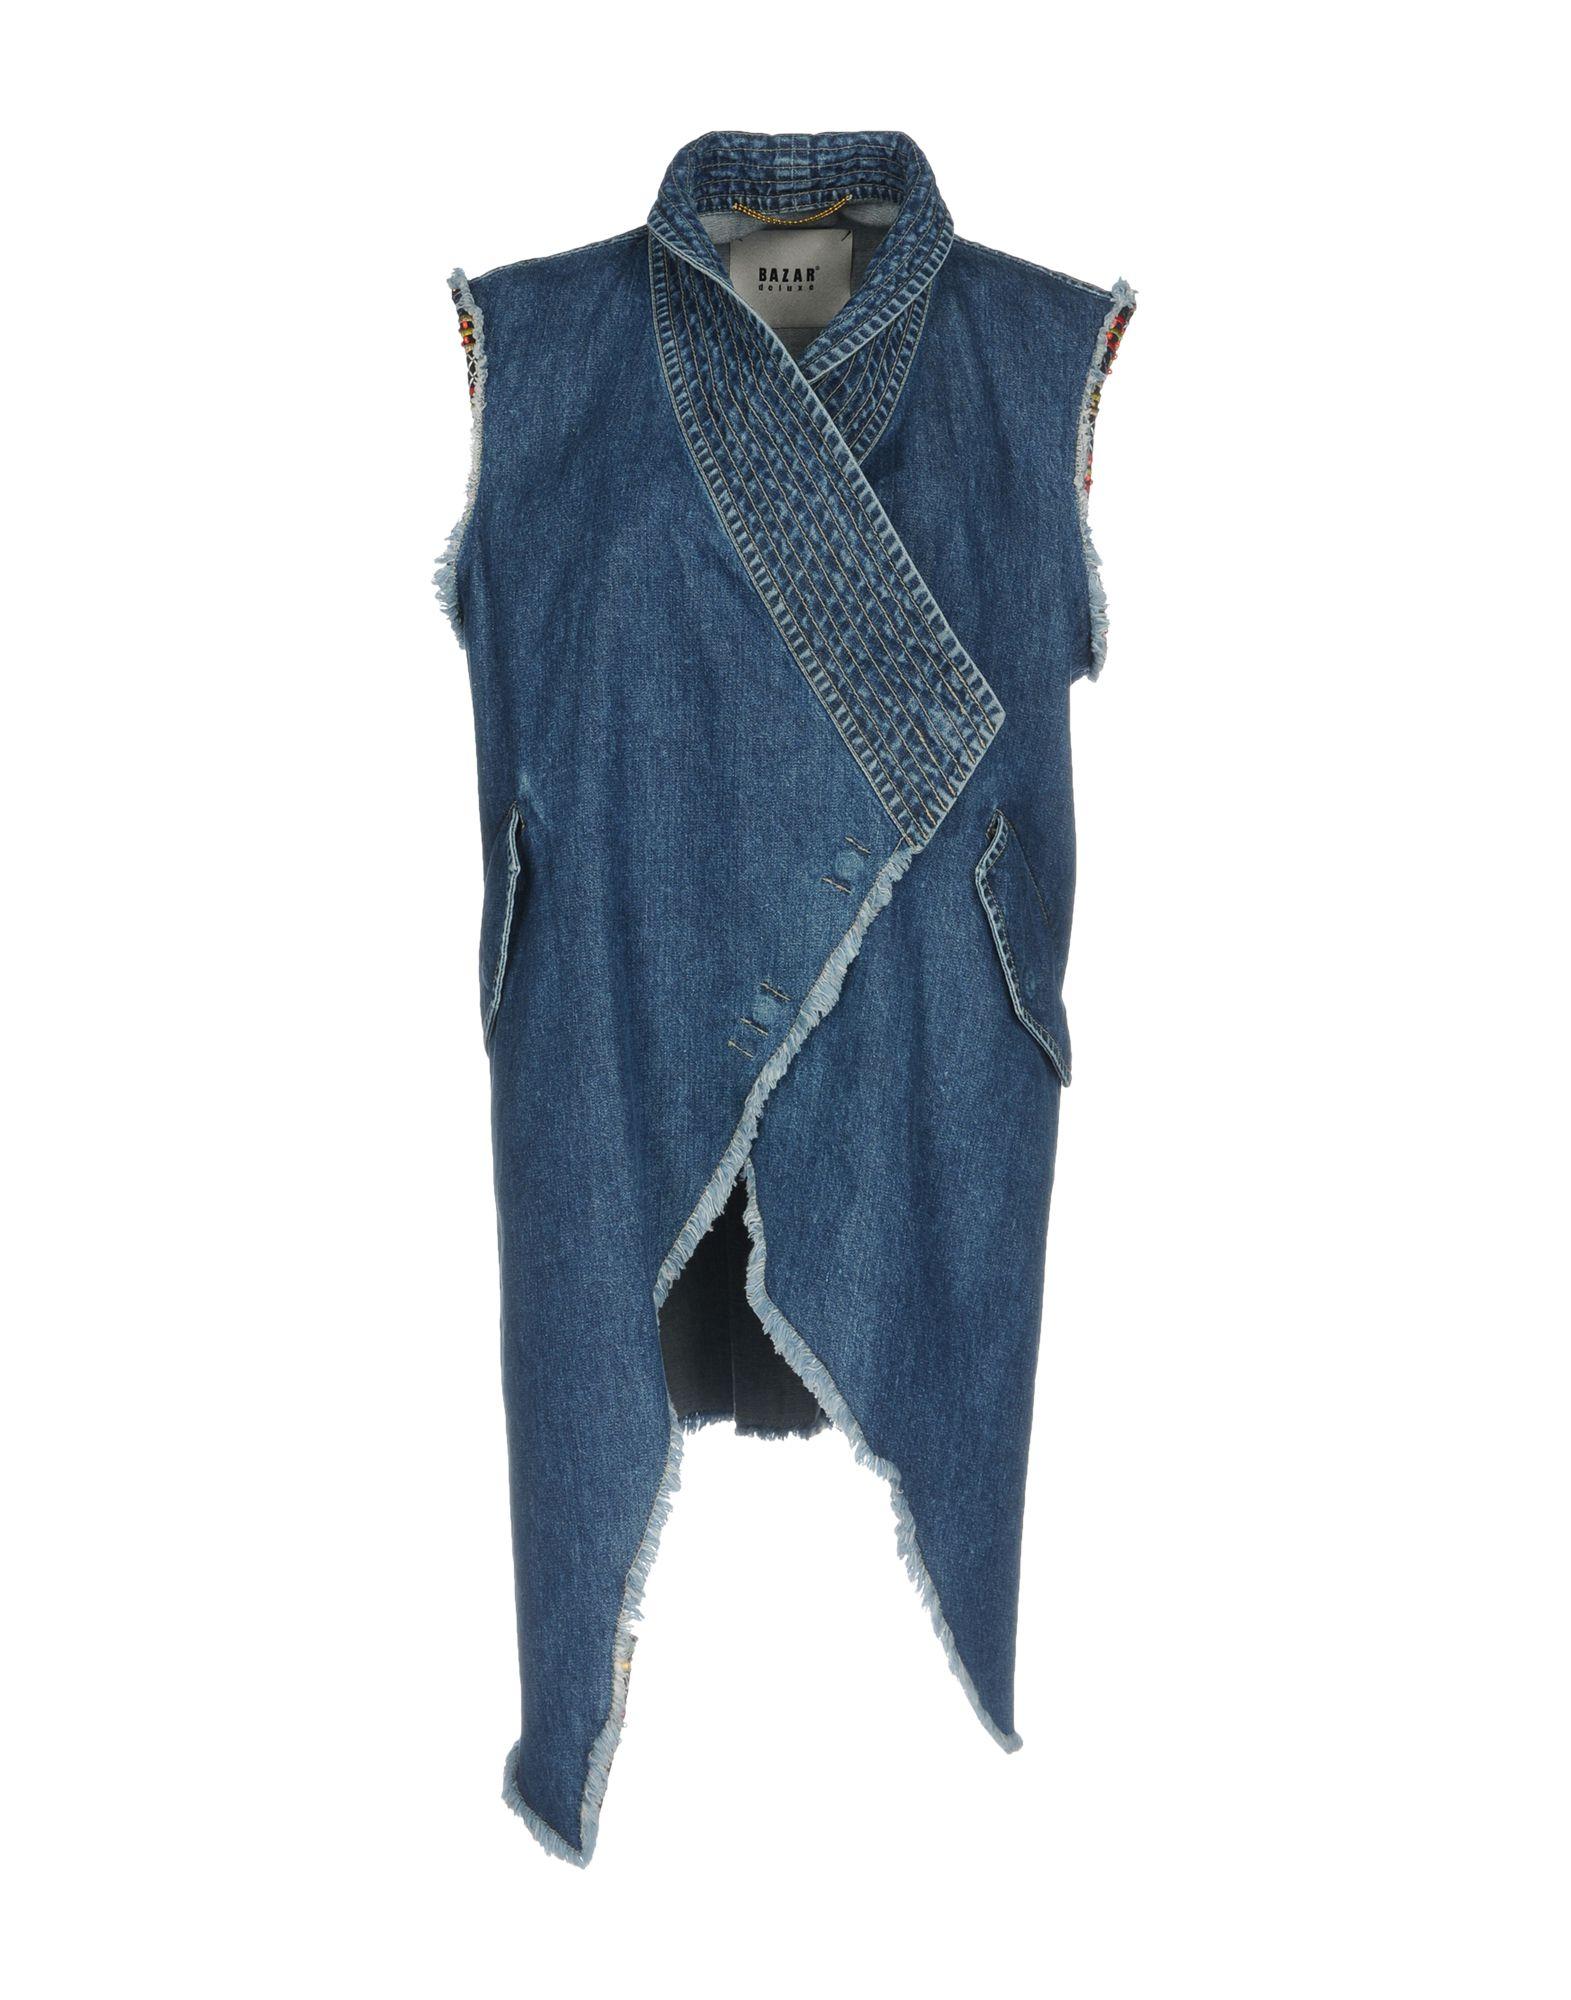 BAZAR DELUXE Джинсовая верхняя одежда верхняя одежда